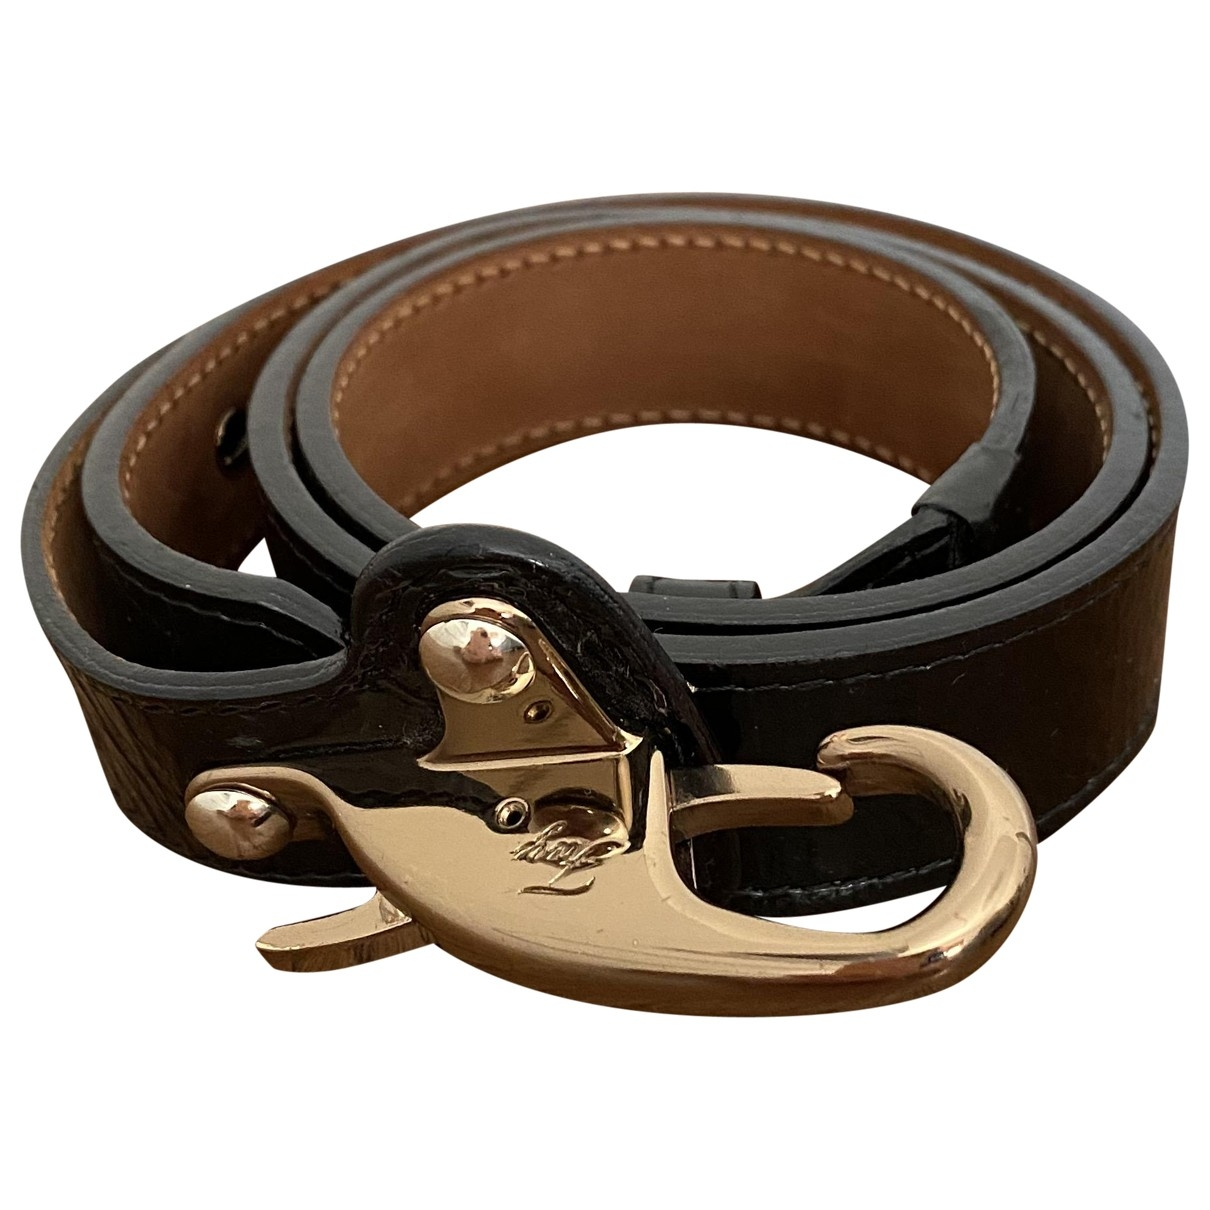 Fay \N Black Patent leather belt for Women M International